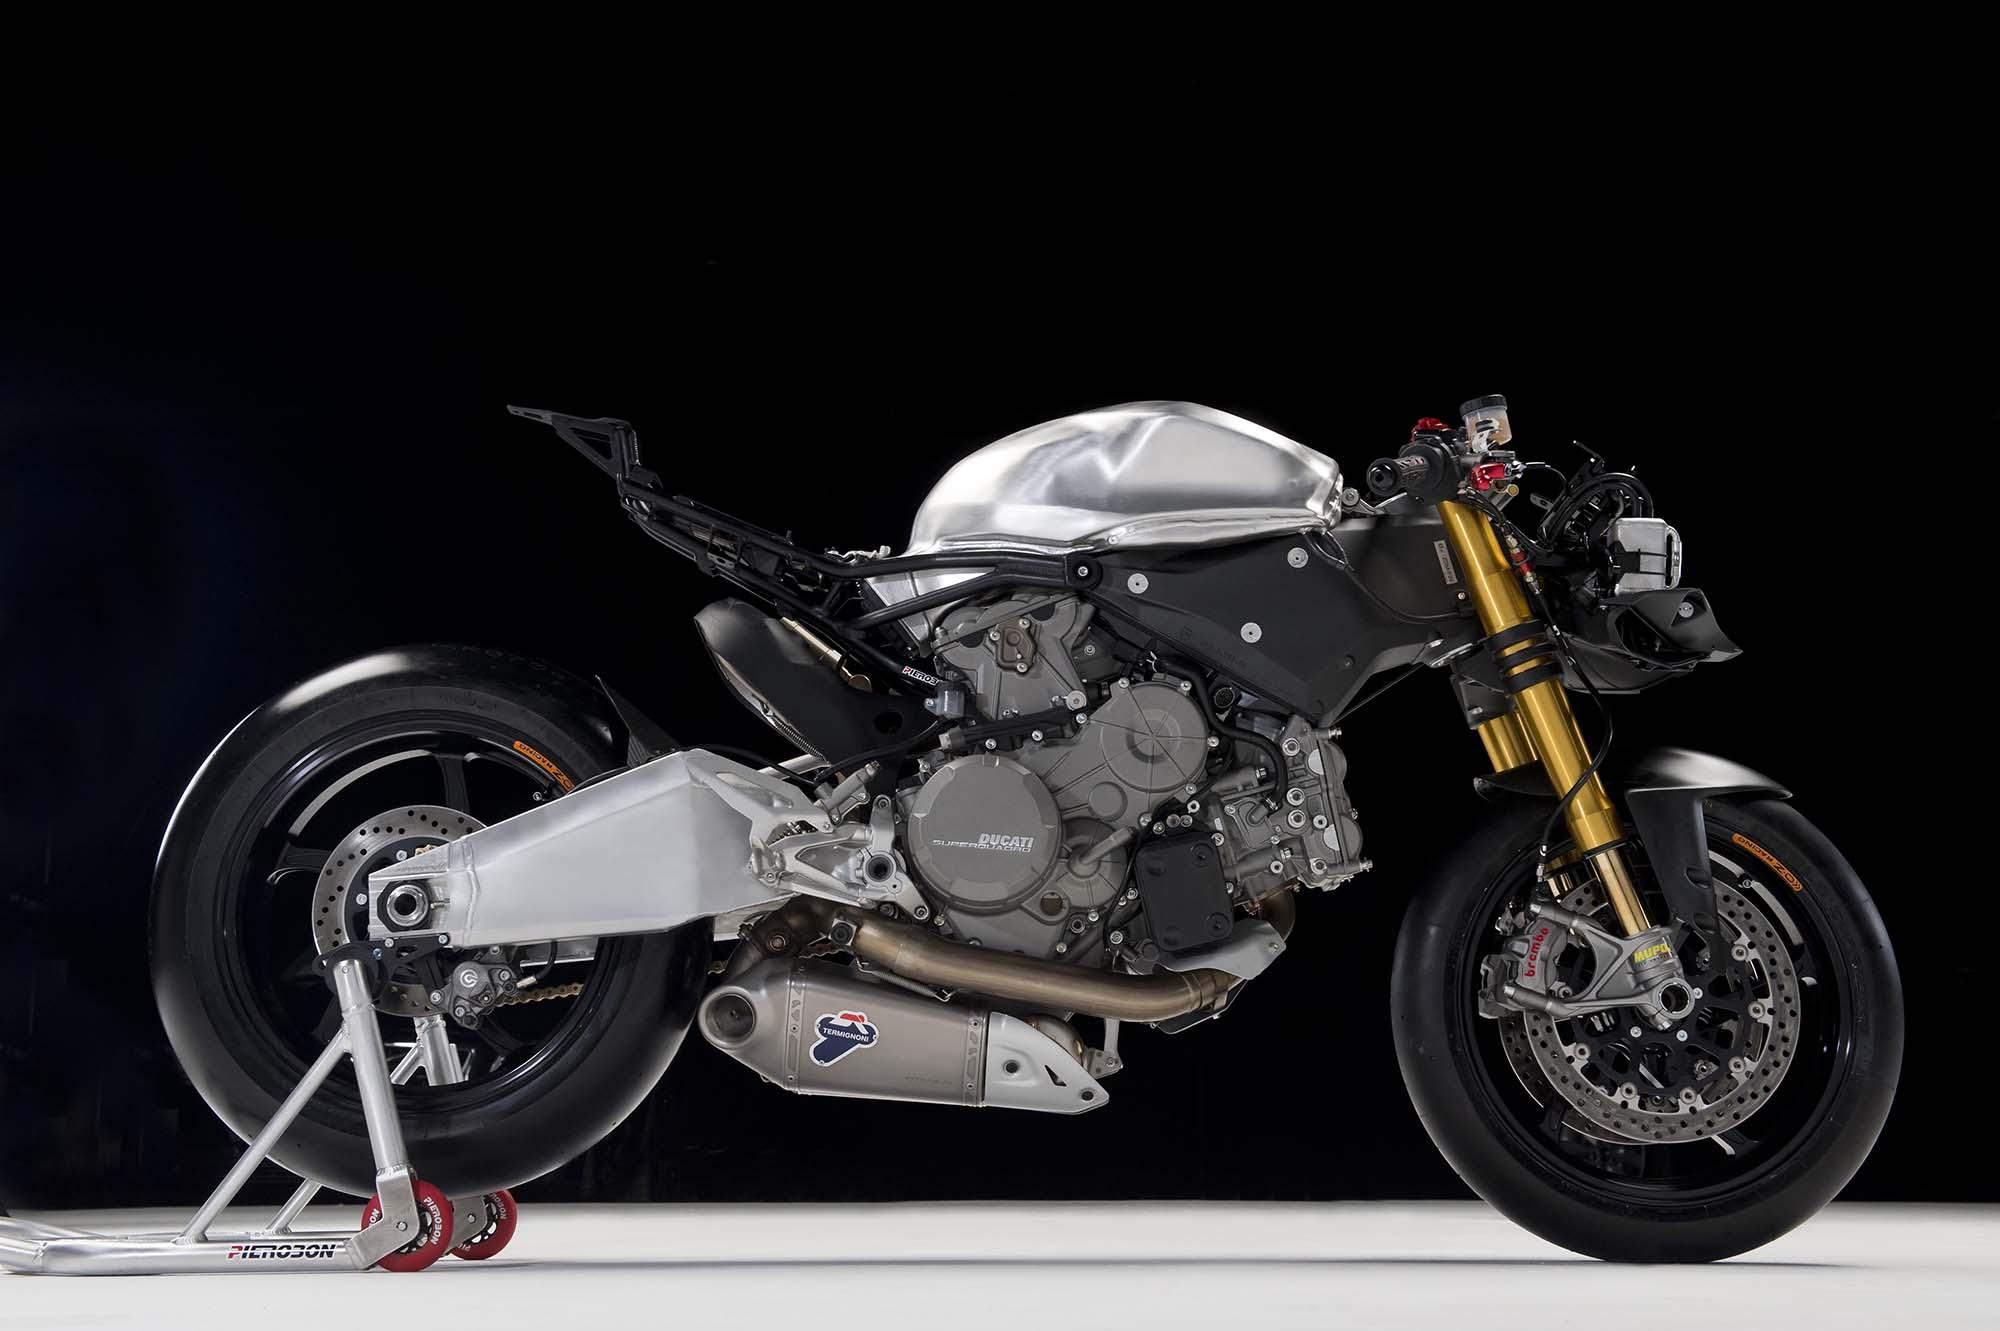 Pierobons Take On The Ducati 899 Panigale - Asphalt  Rubber-3962